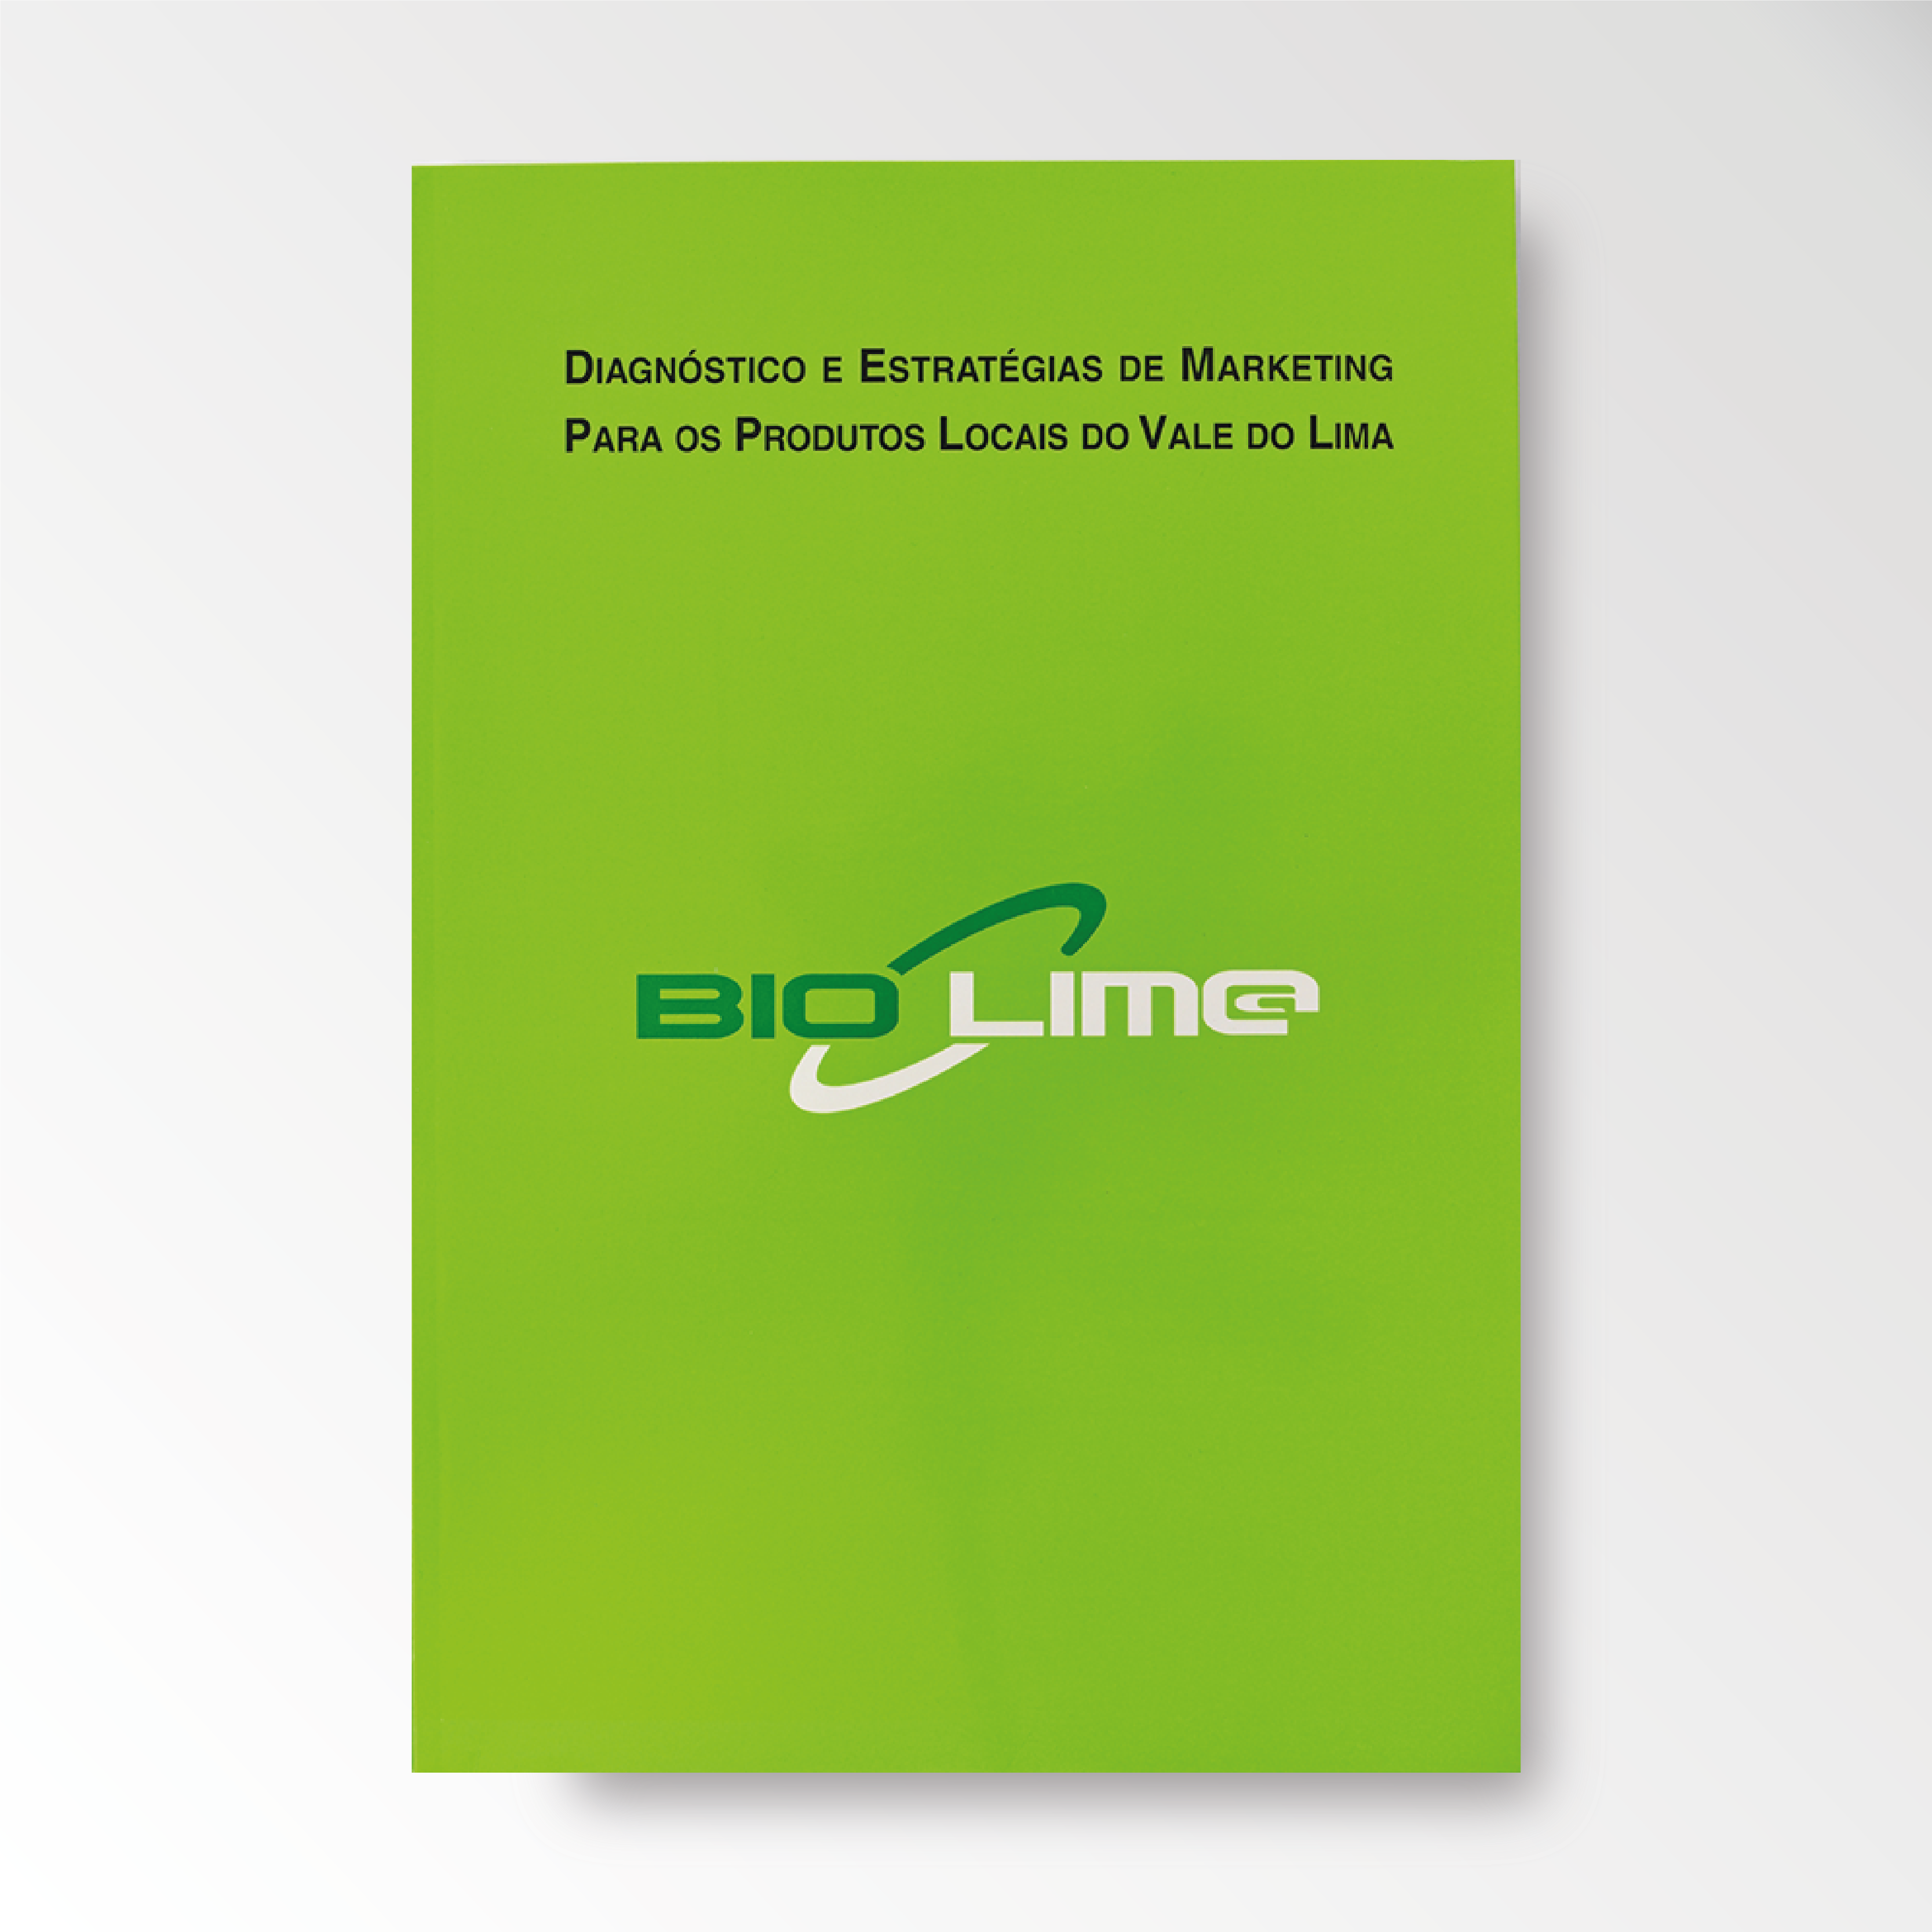 axis-diagnostico-marketing-bio-lima